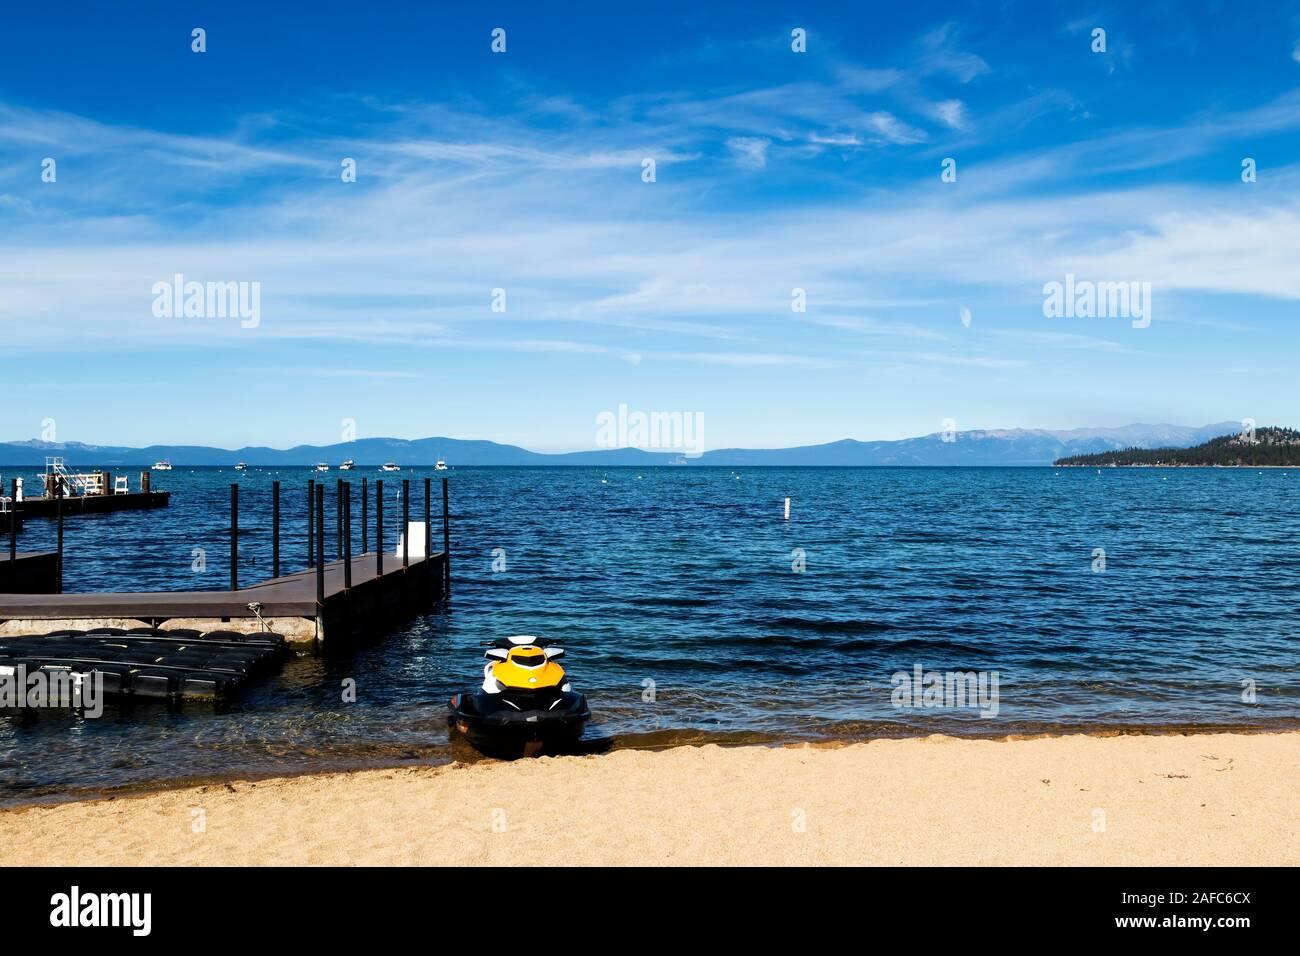 South Lake Tahoe With Blue Sky White Clouds Docks And Ski Jet On Sand Beach Stock Photo